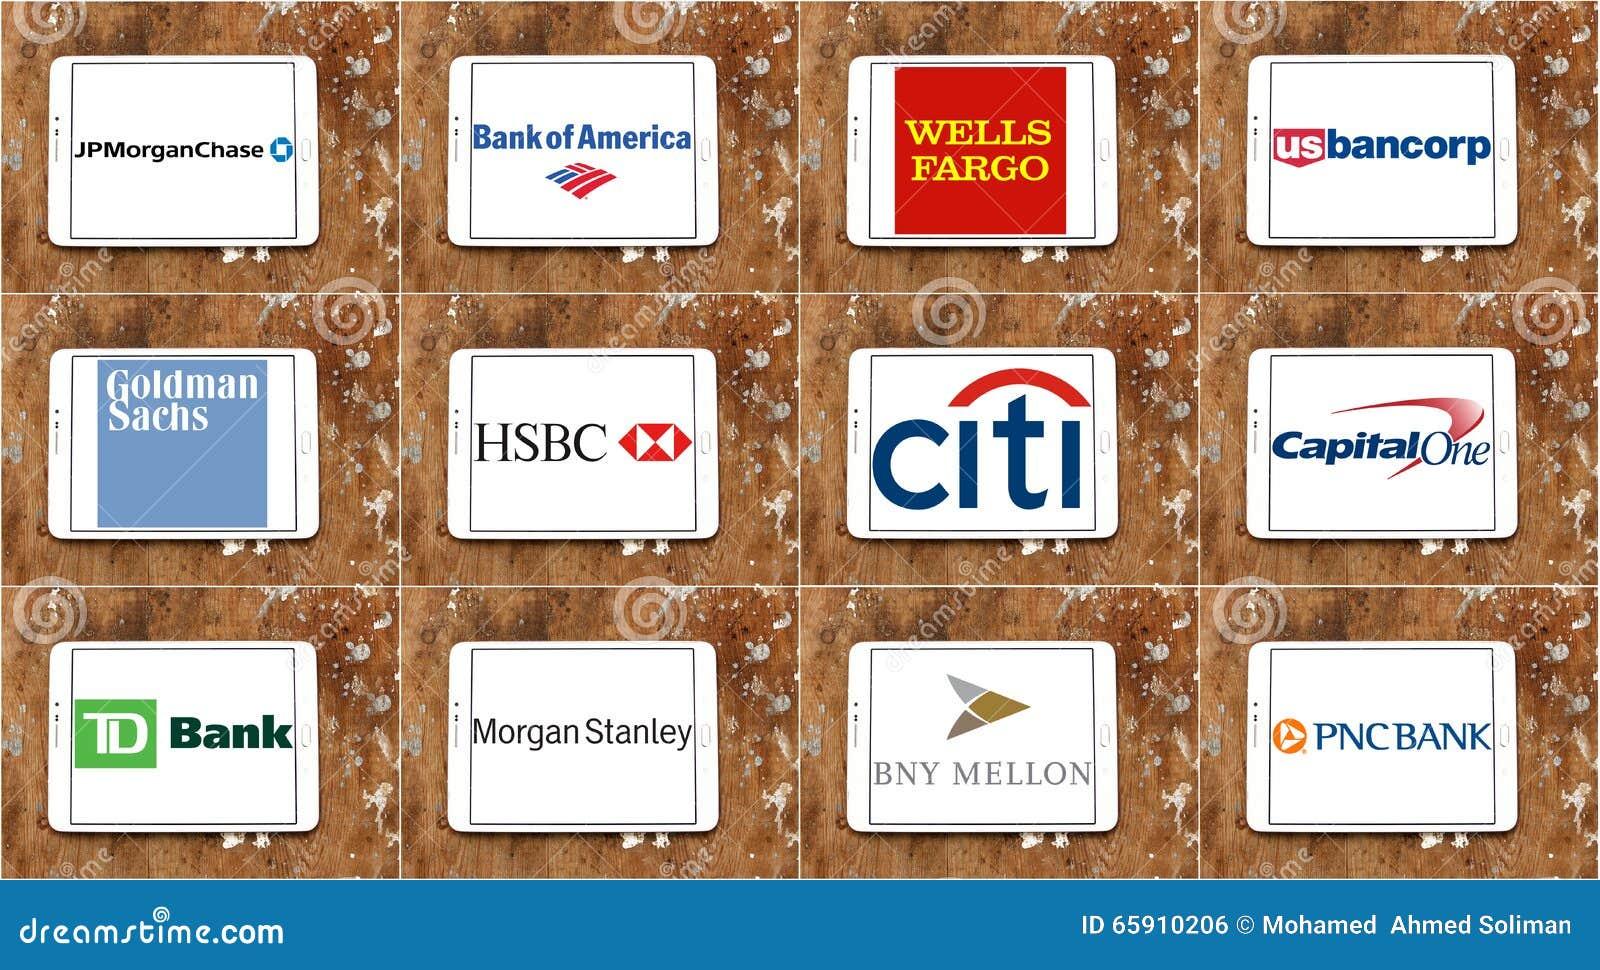 Usa Banks Brands And Logos Editorial Photo. Image Of